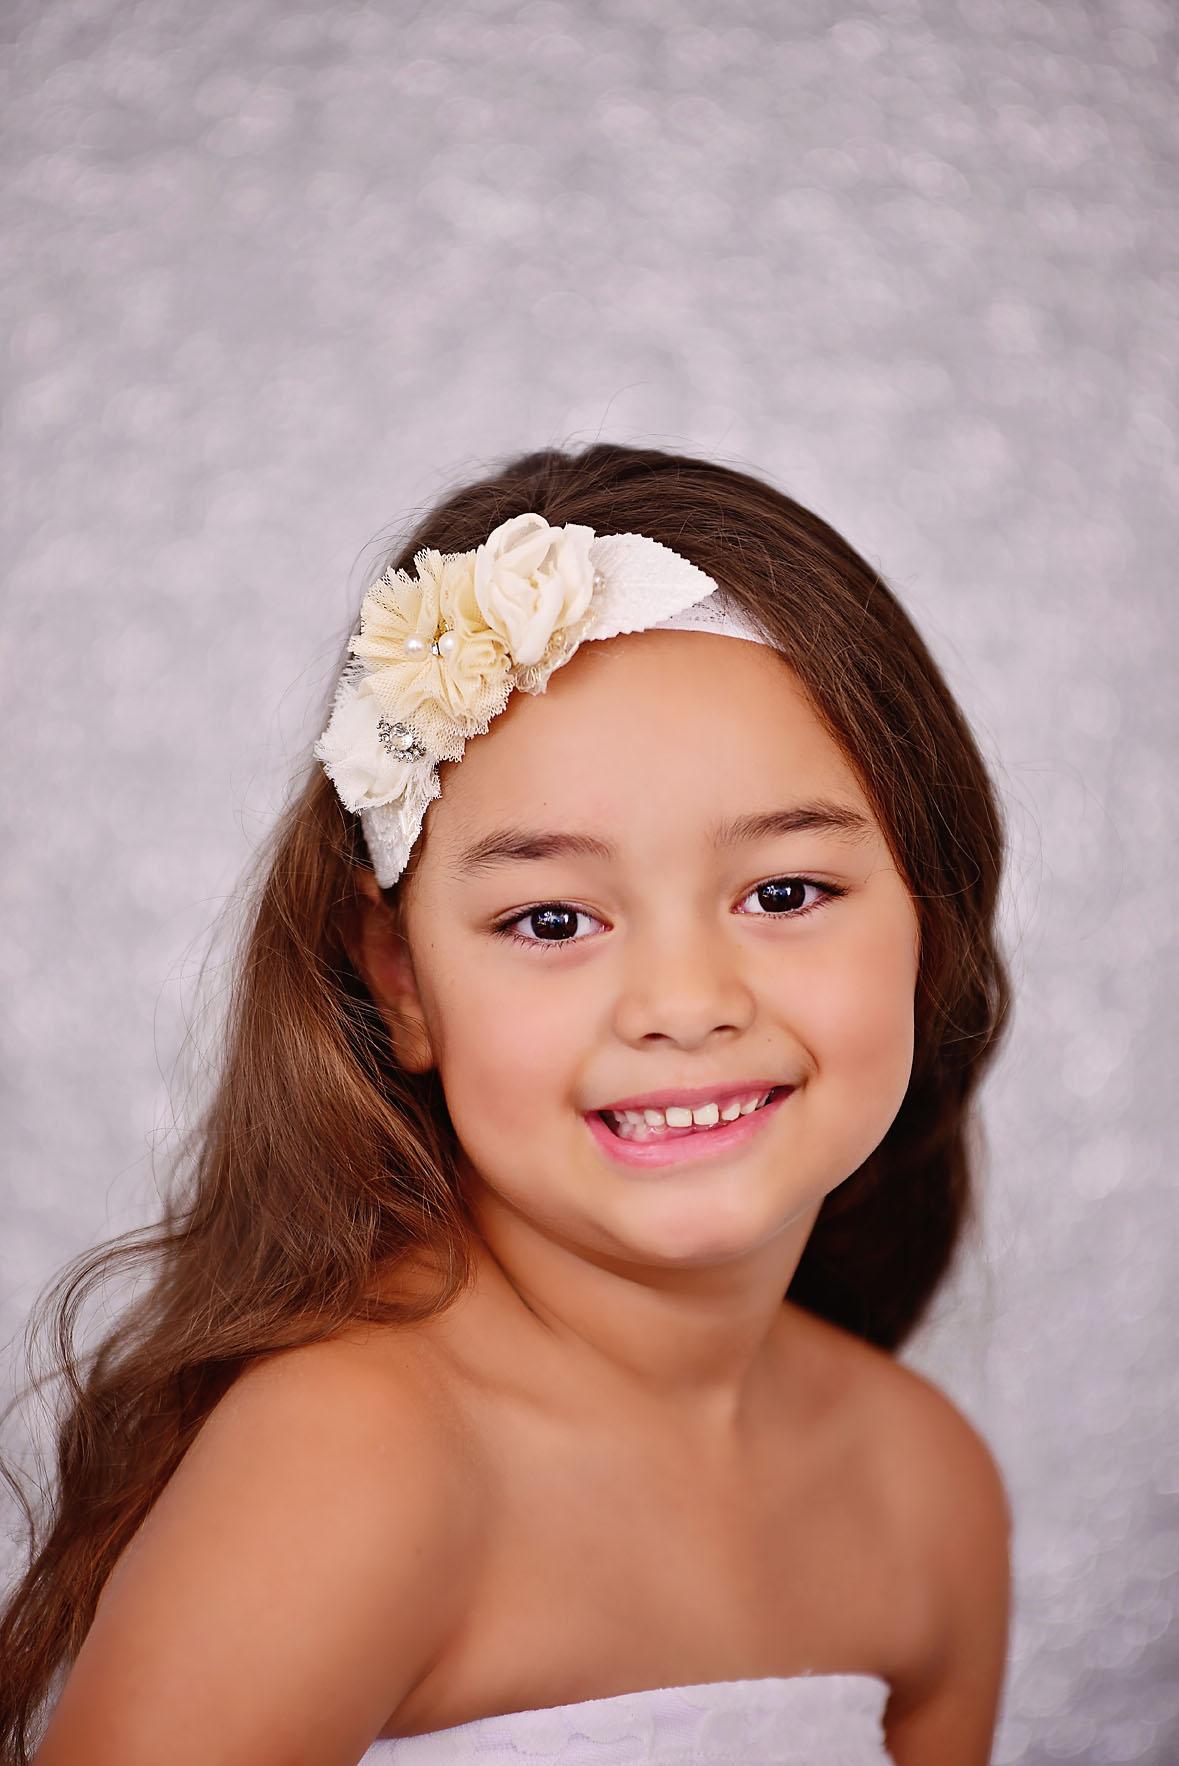 2015 wearing headband flower headband in white 2015 wearing headband flower headband in white